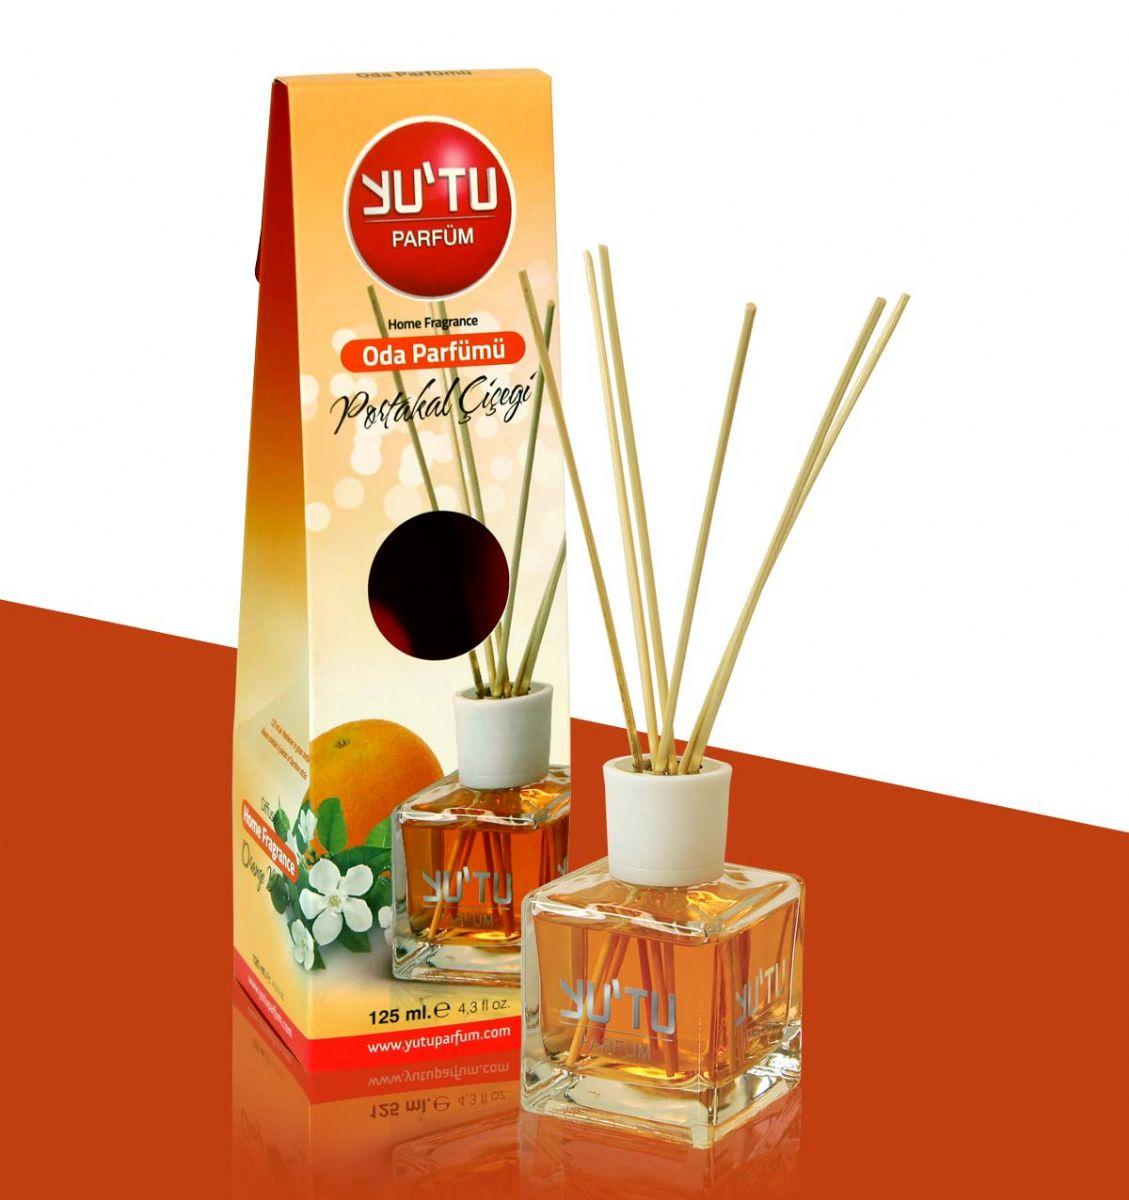 yutu-oda-parfumu-portakal-cicegi